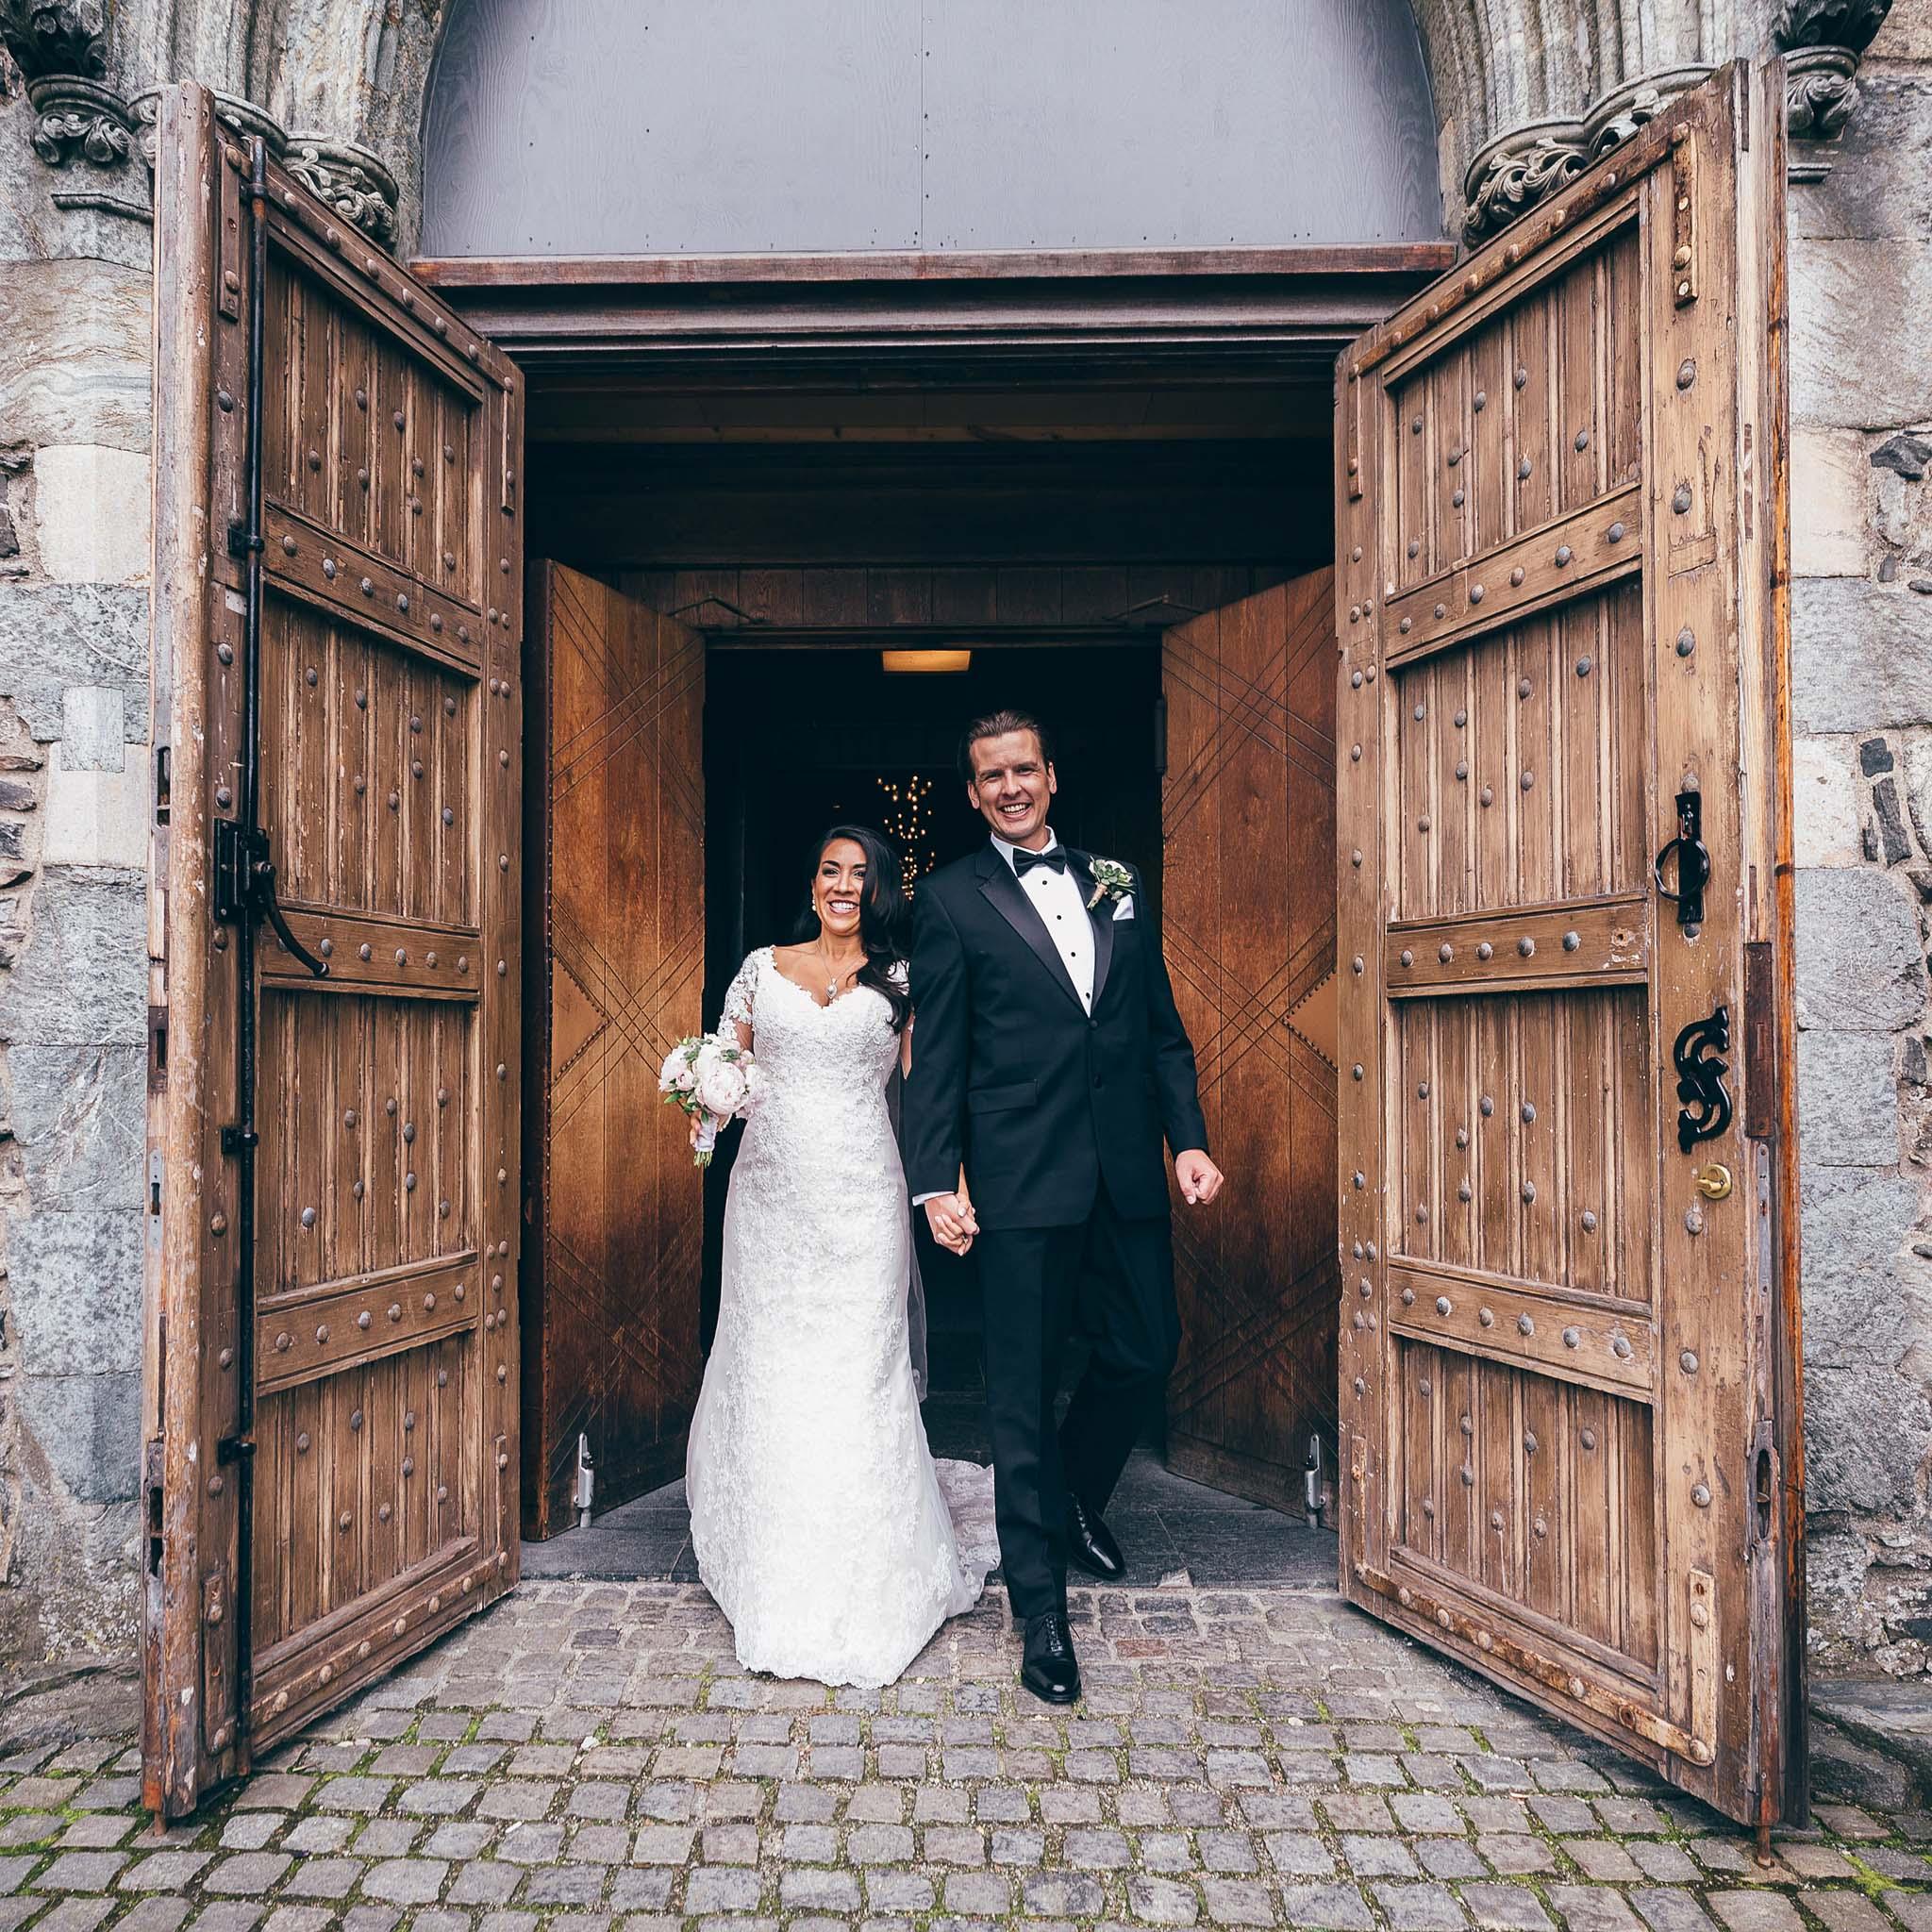 Wedding+Photographer+Norway+Bryllupsfotograf+Casey+Arneson+MK-135.jpg